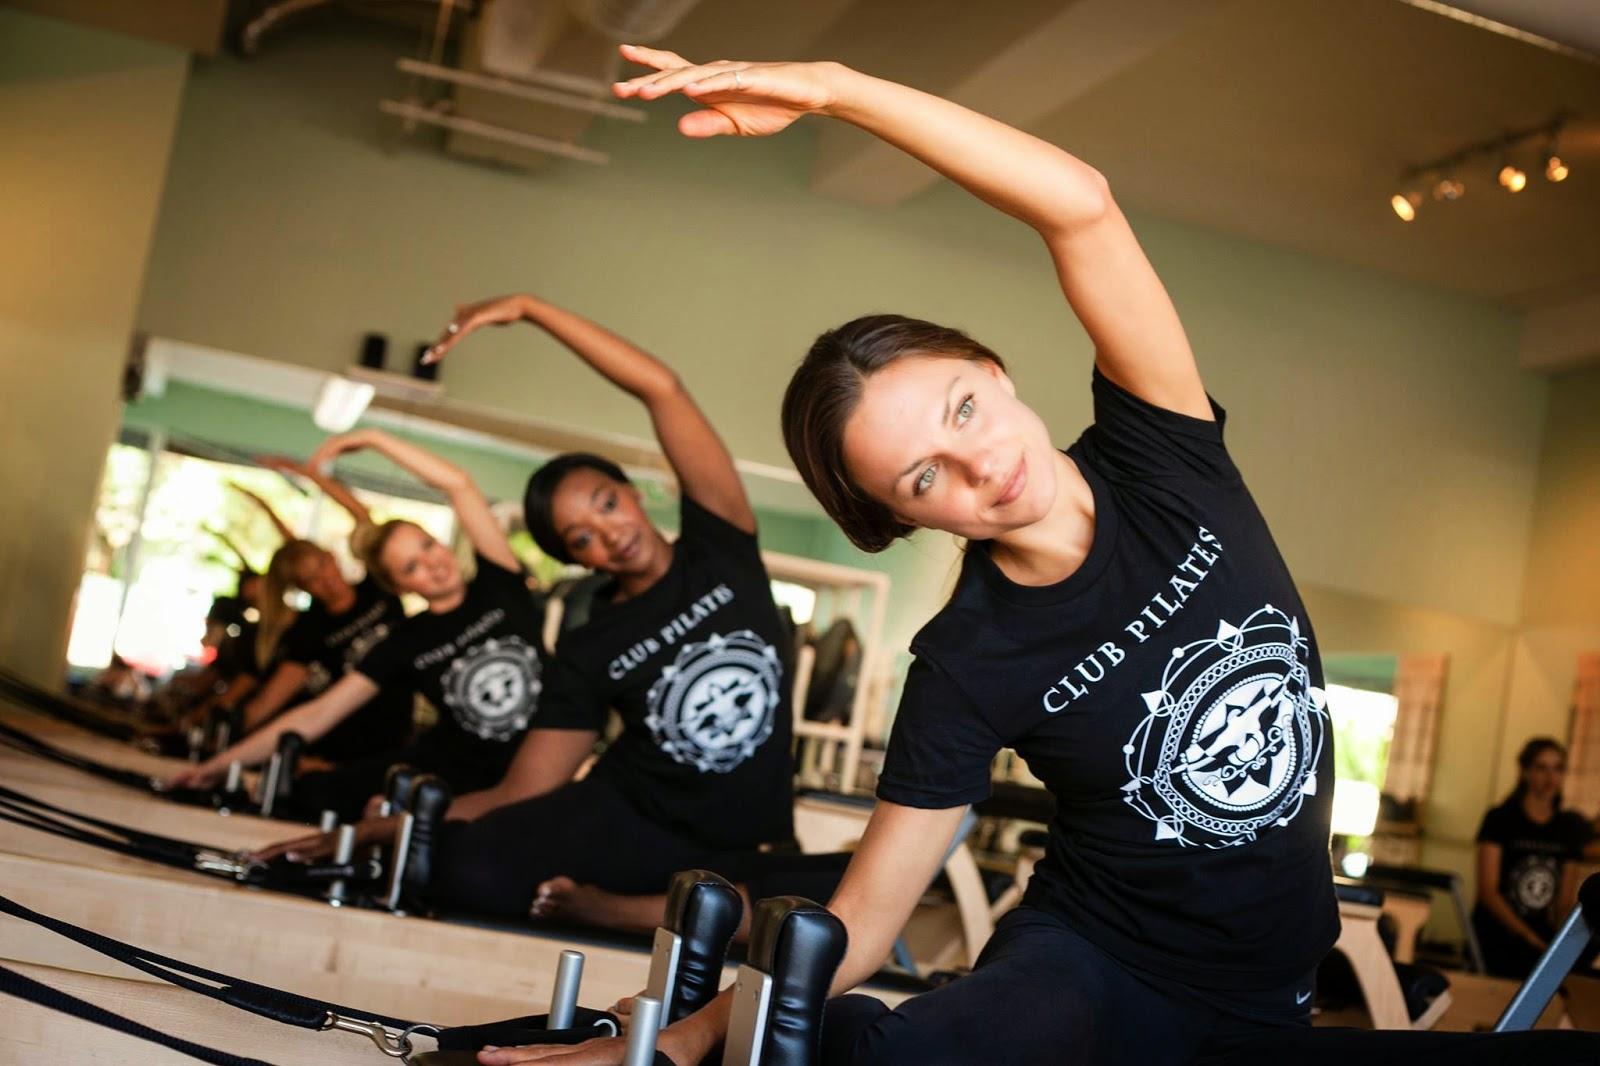 Club Pilates Cherry Creek, Reformer Pilates, Pilates clubs in Denver, Denver Pilates classes, Pilates in Colorado, Pilates classes in Colorado